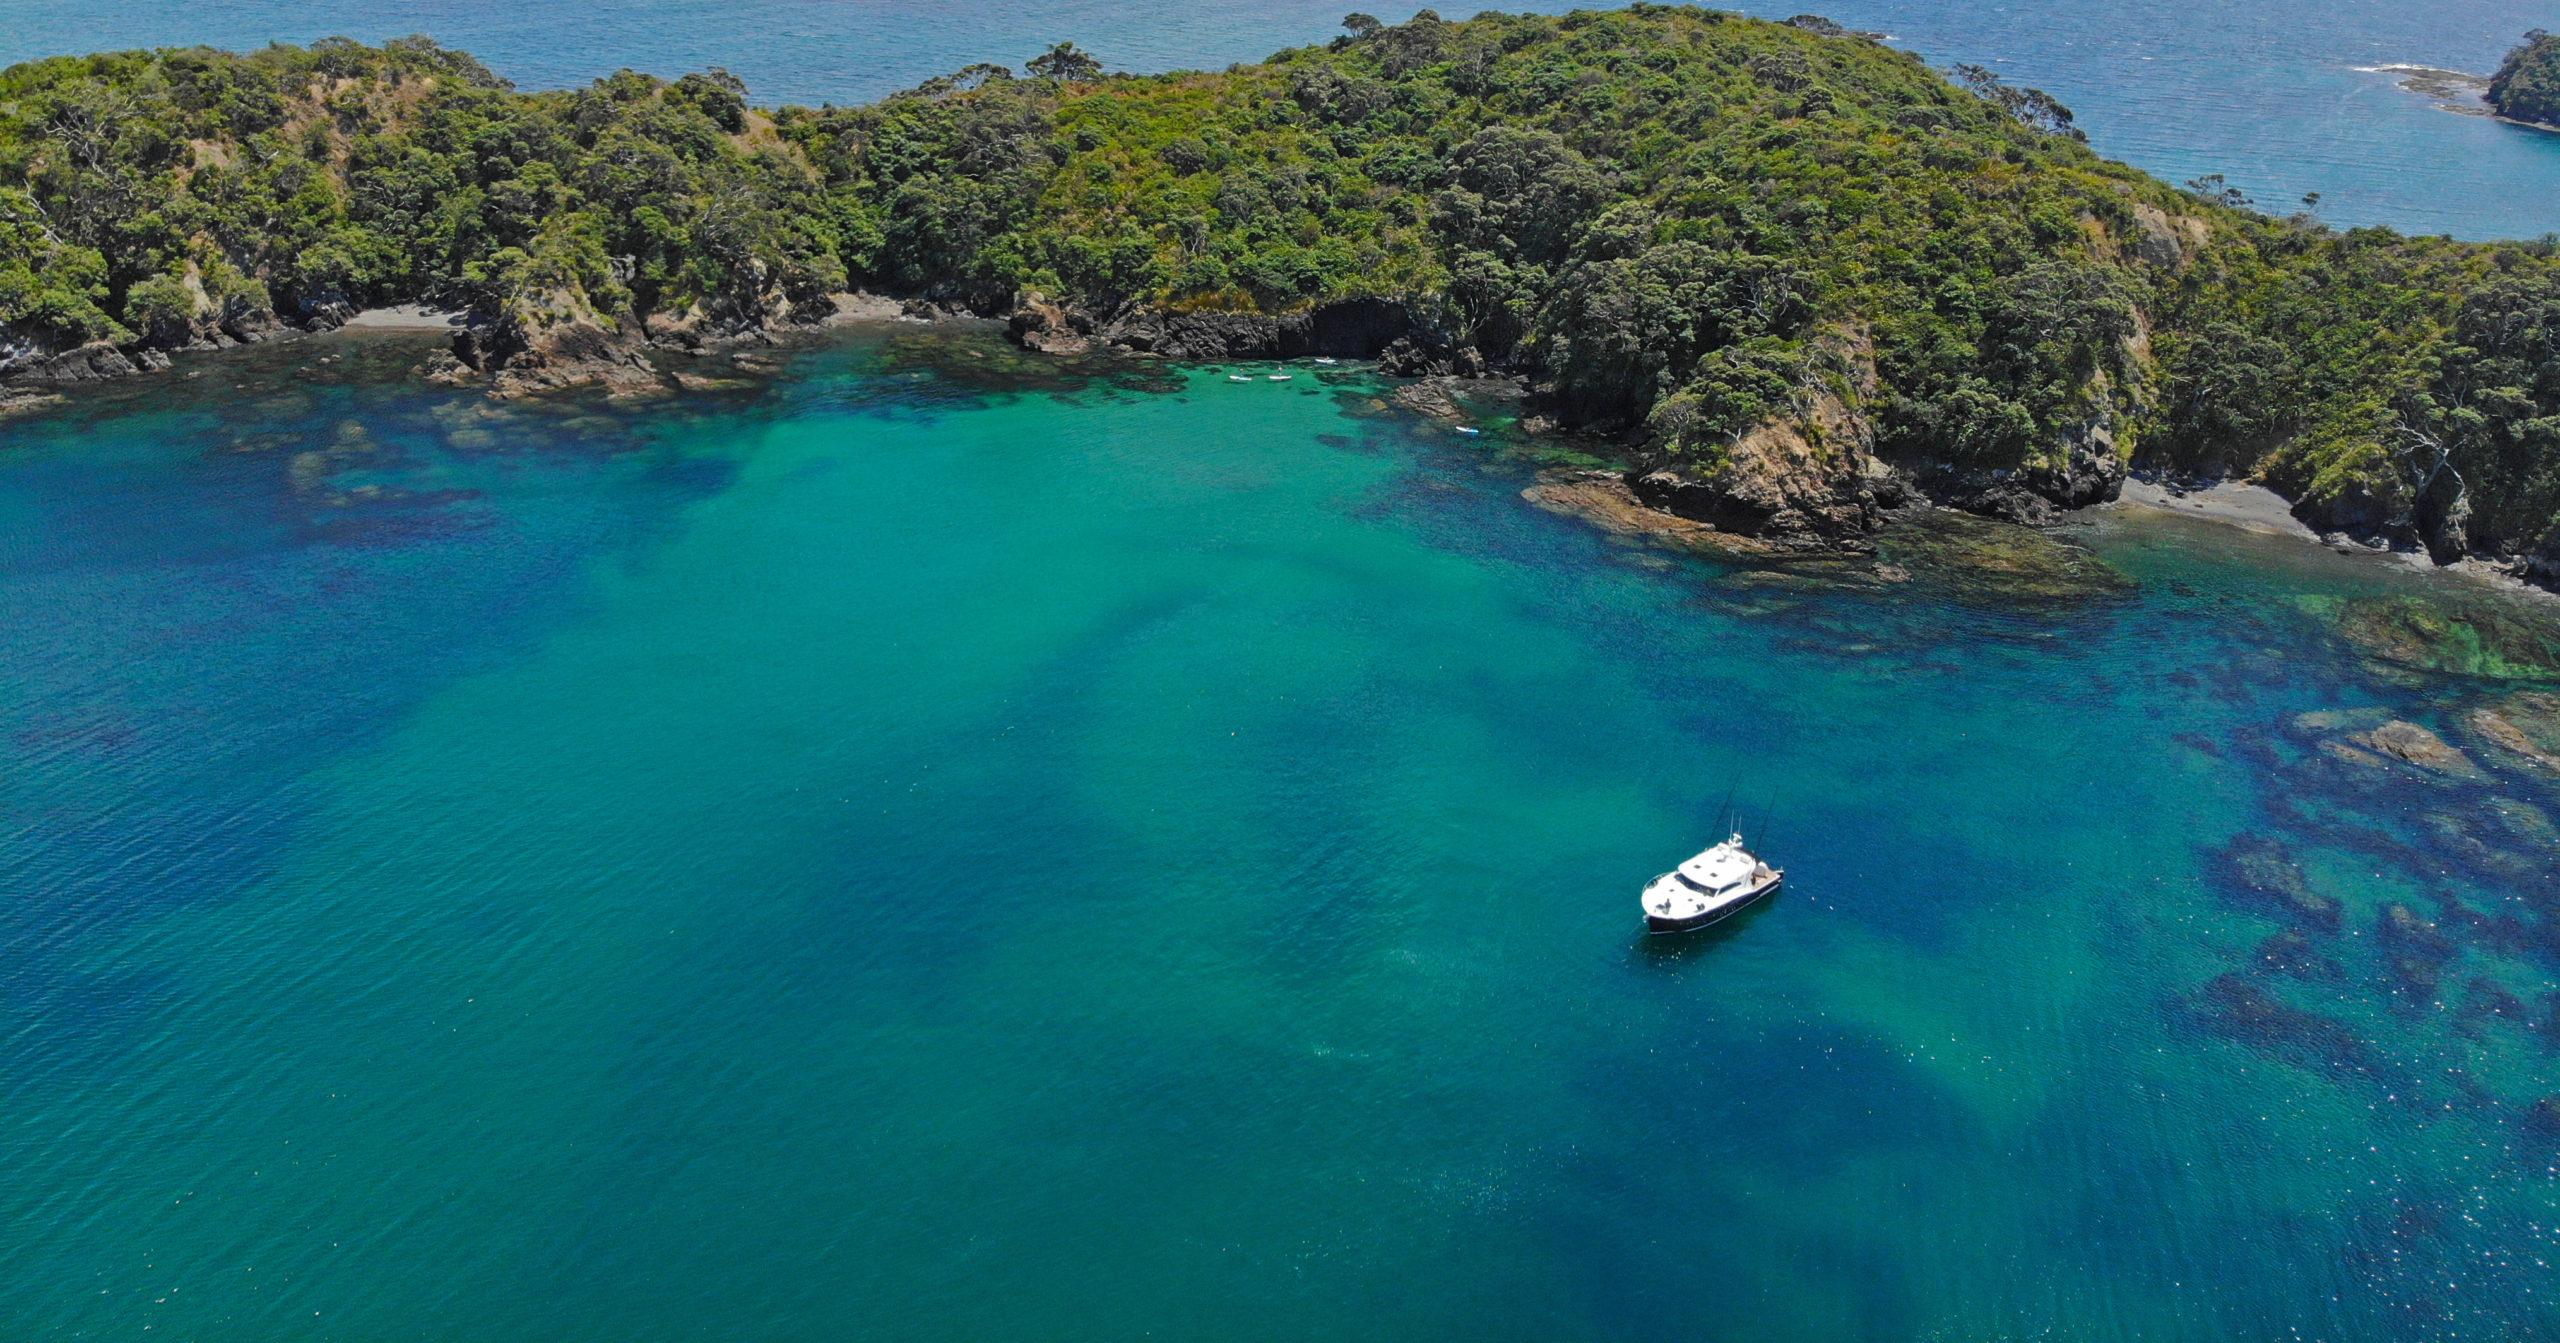 Ruru-Drone-Shot-with-island-in-background-scaled